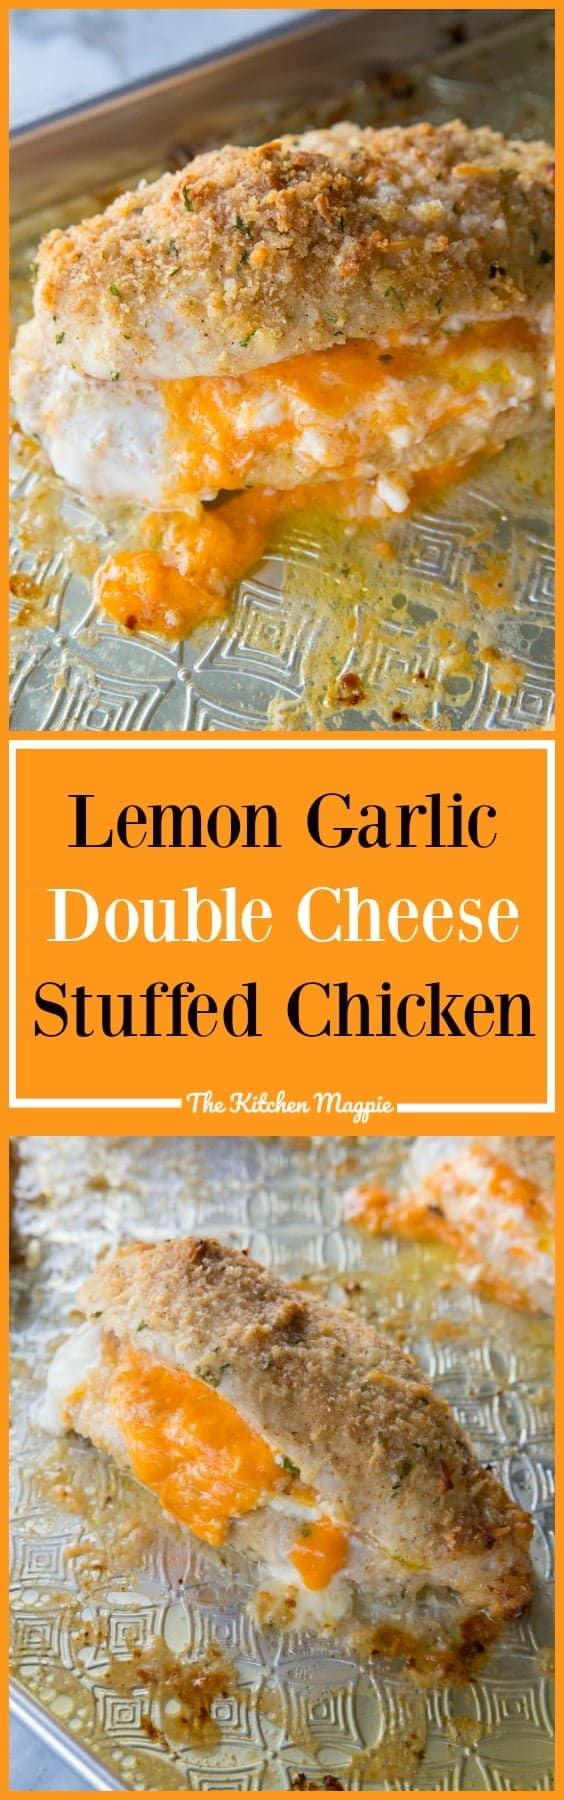 Lemon Garlic Double Cheese Stuffed Chicken From @thekitchenmagpie